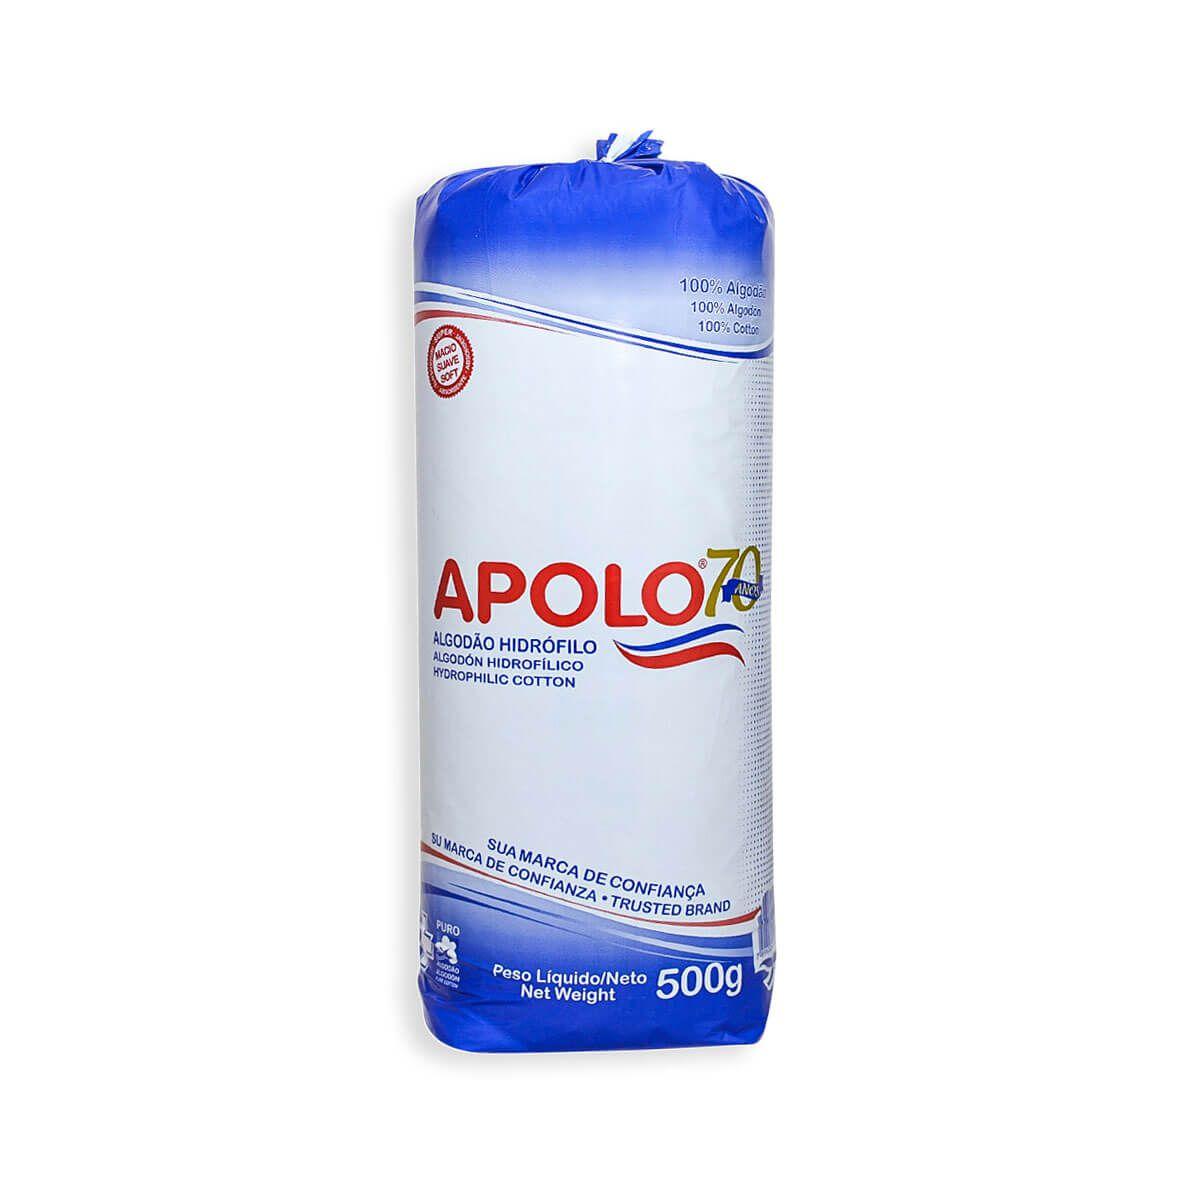 Algodão Hidrófilo Apolo Rolo 500g